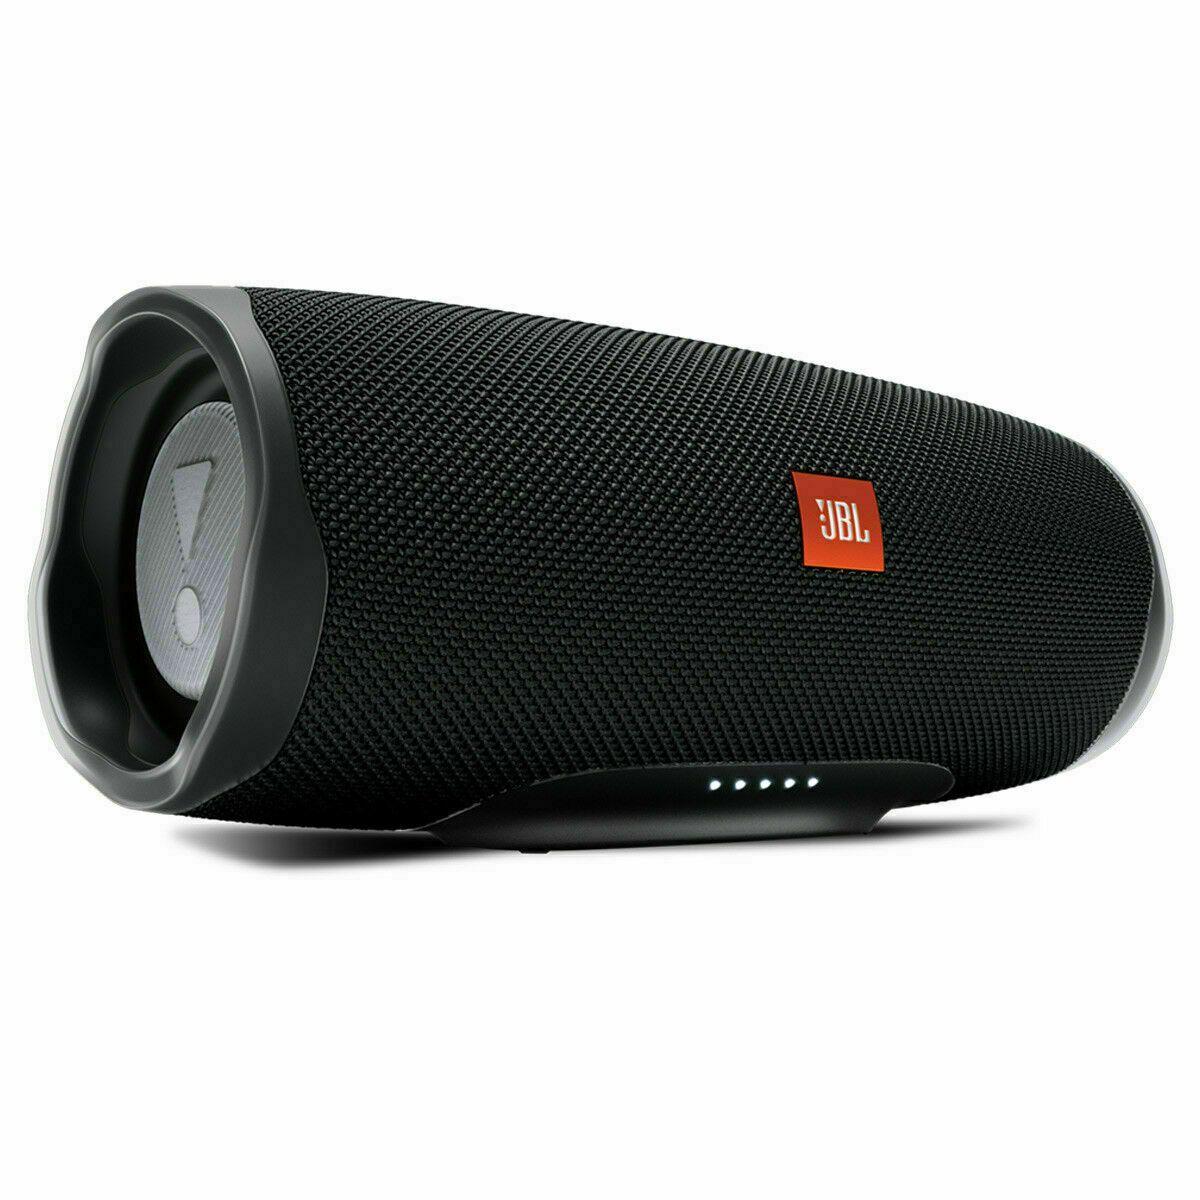 Jbl Charge 4 Portable Bluetooth Speaker Black Mint Bluetooth Speakers Portable Wireless Speakers Bluetooth Bluetooth Speaker